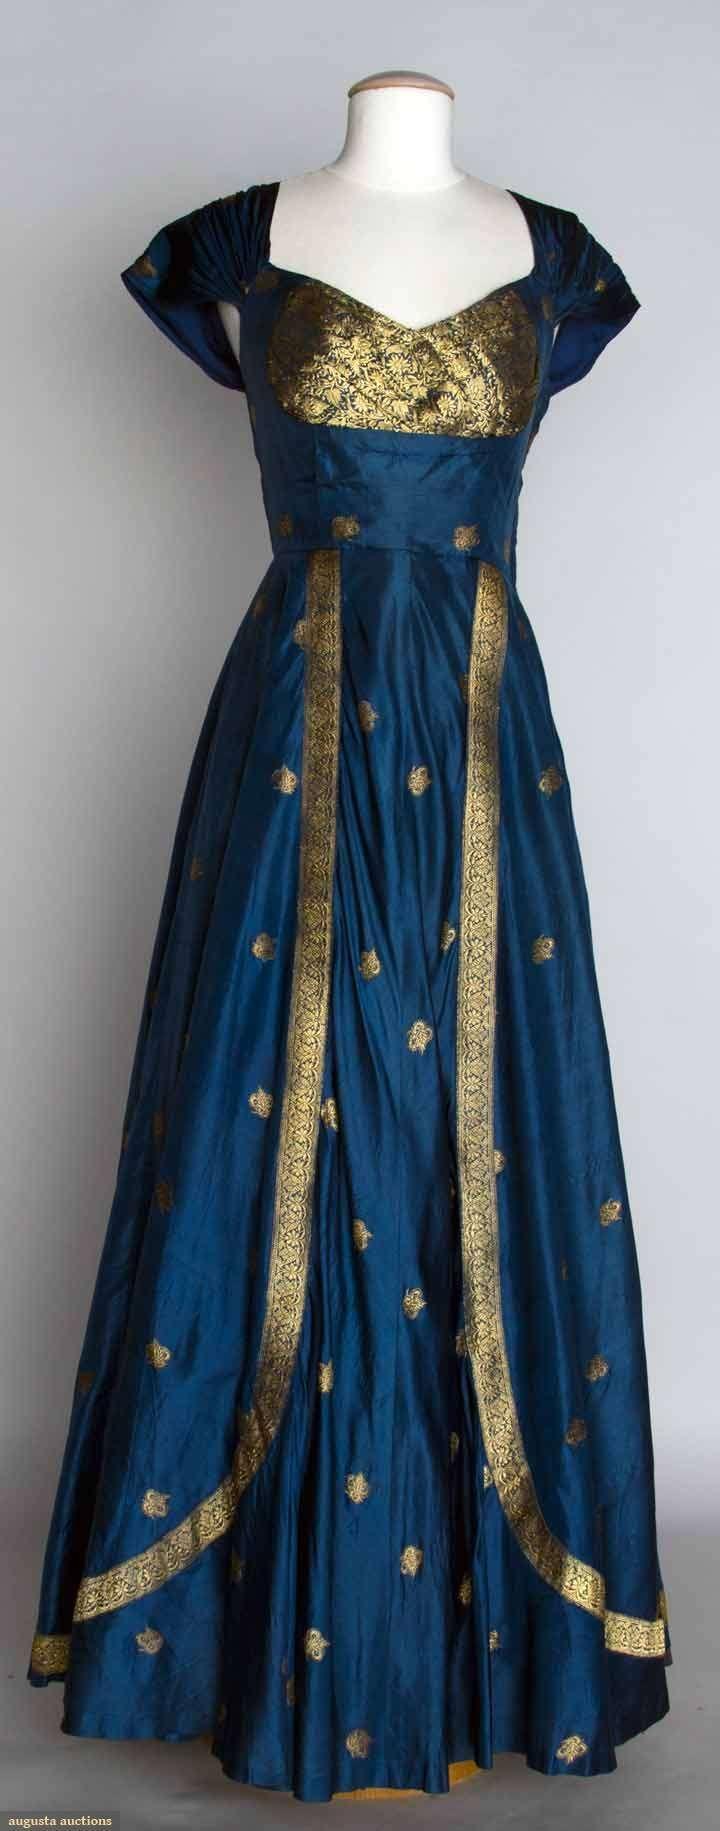 1950 Blue silk taffeta w/ metallic gold brocade dress, fashioned from Indian sari.